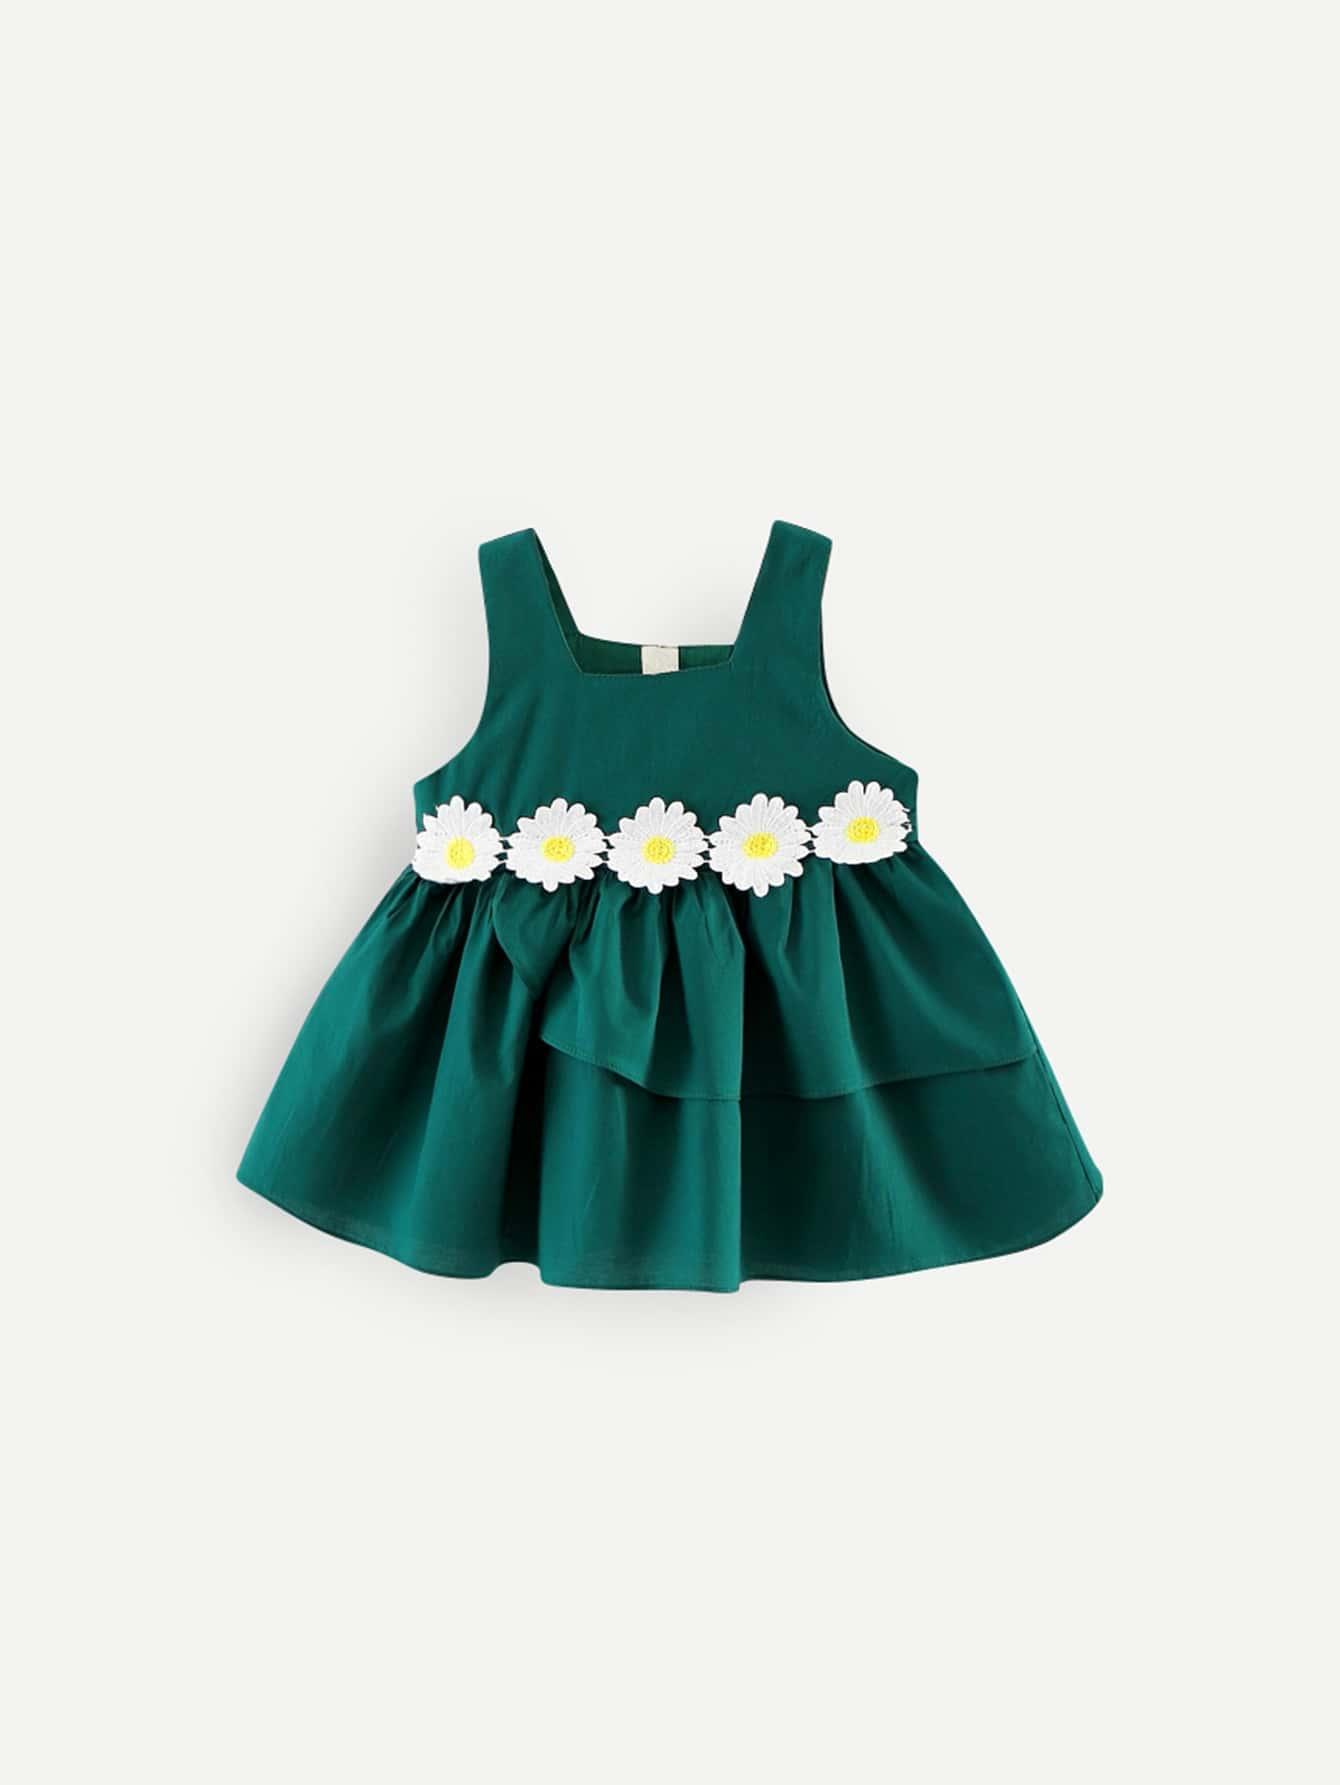 Girls Flower Embroidery Ruffle Hem Solid Dress eyelet embroidery ruffle hem dress